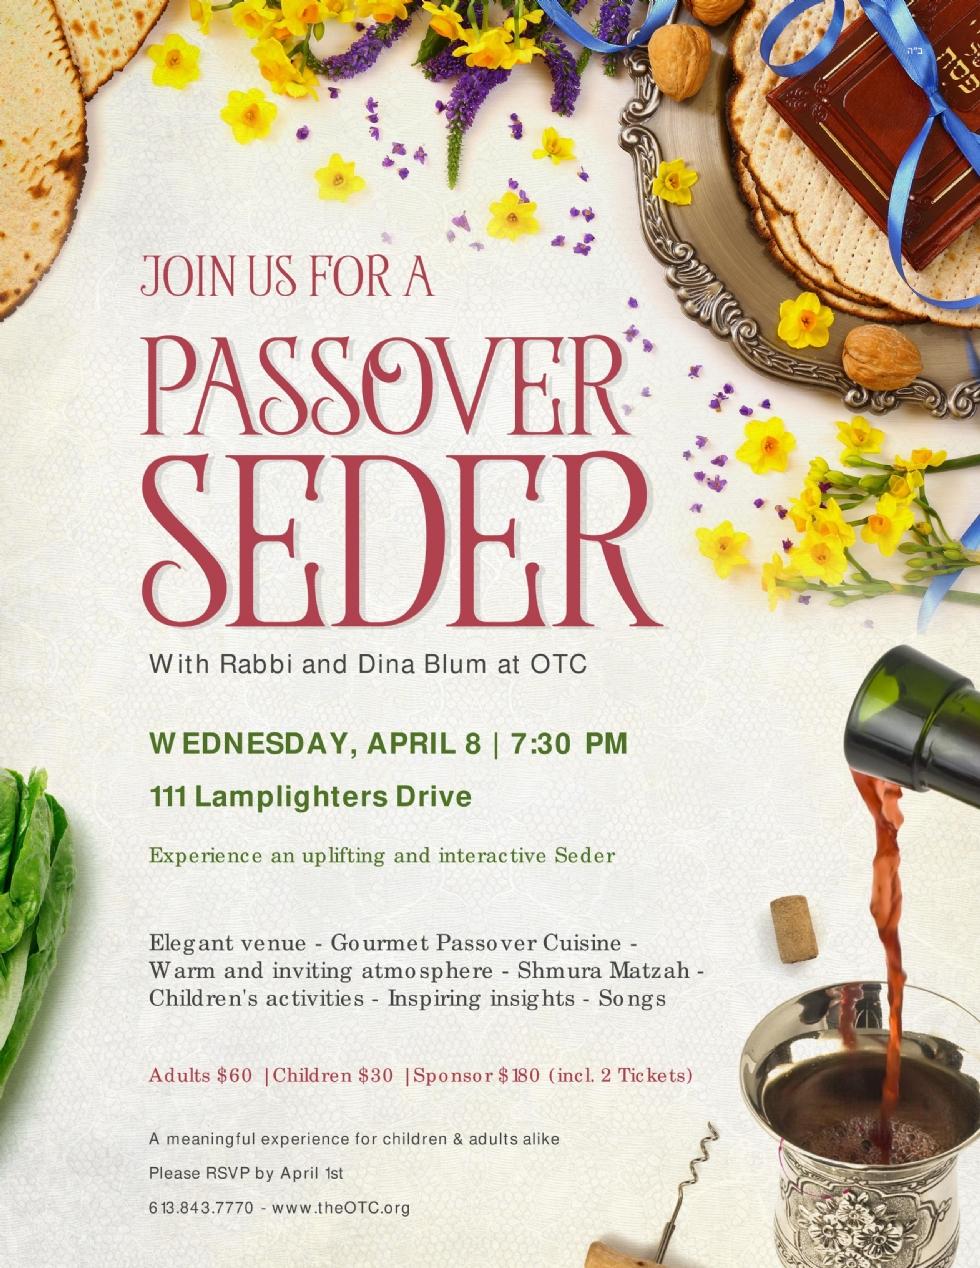 Passover Seder 5780-page-001.jpg